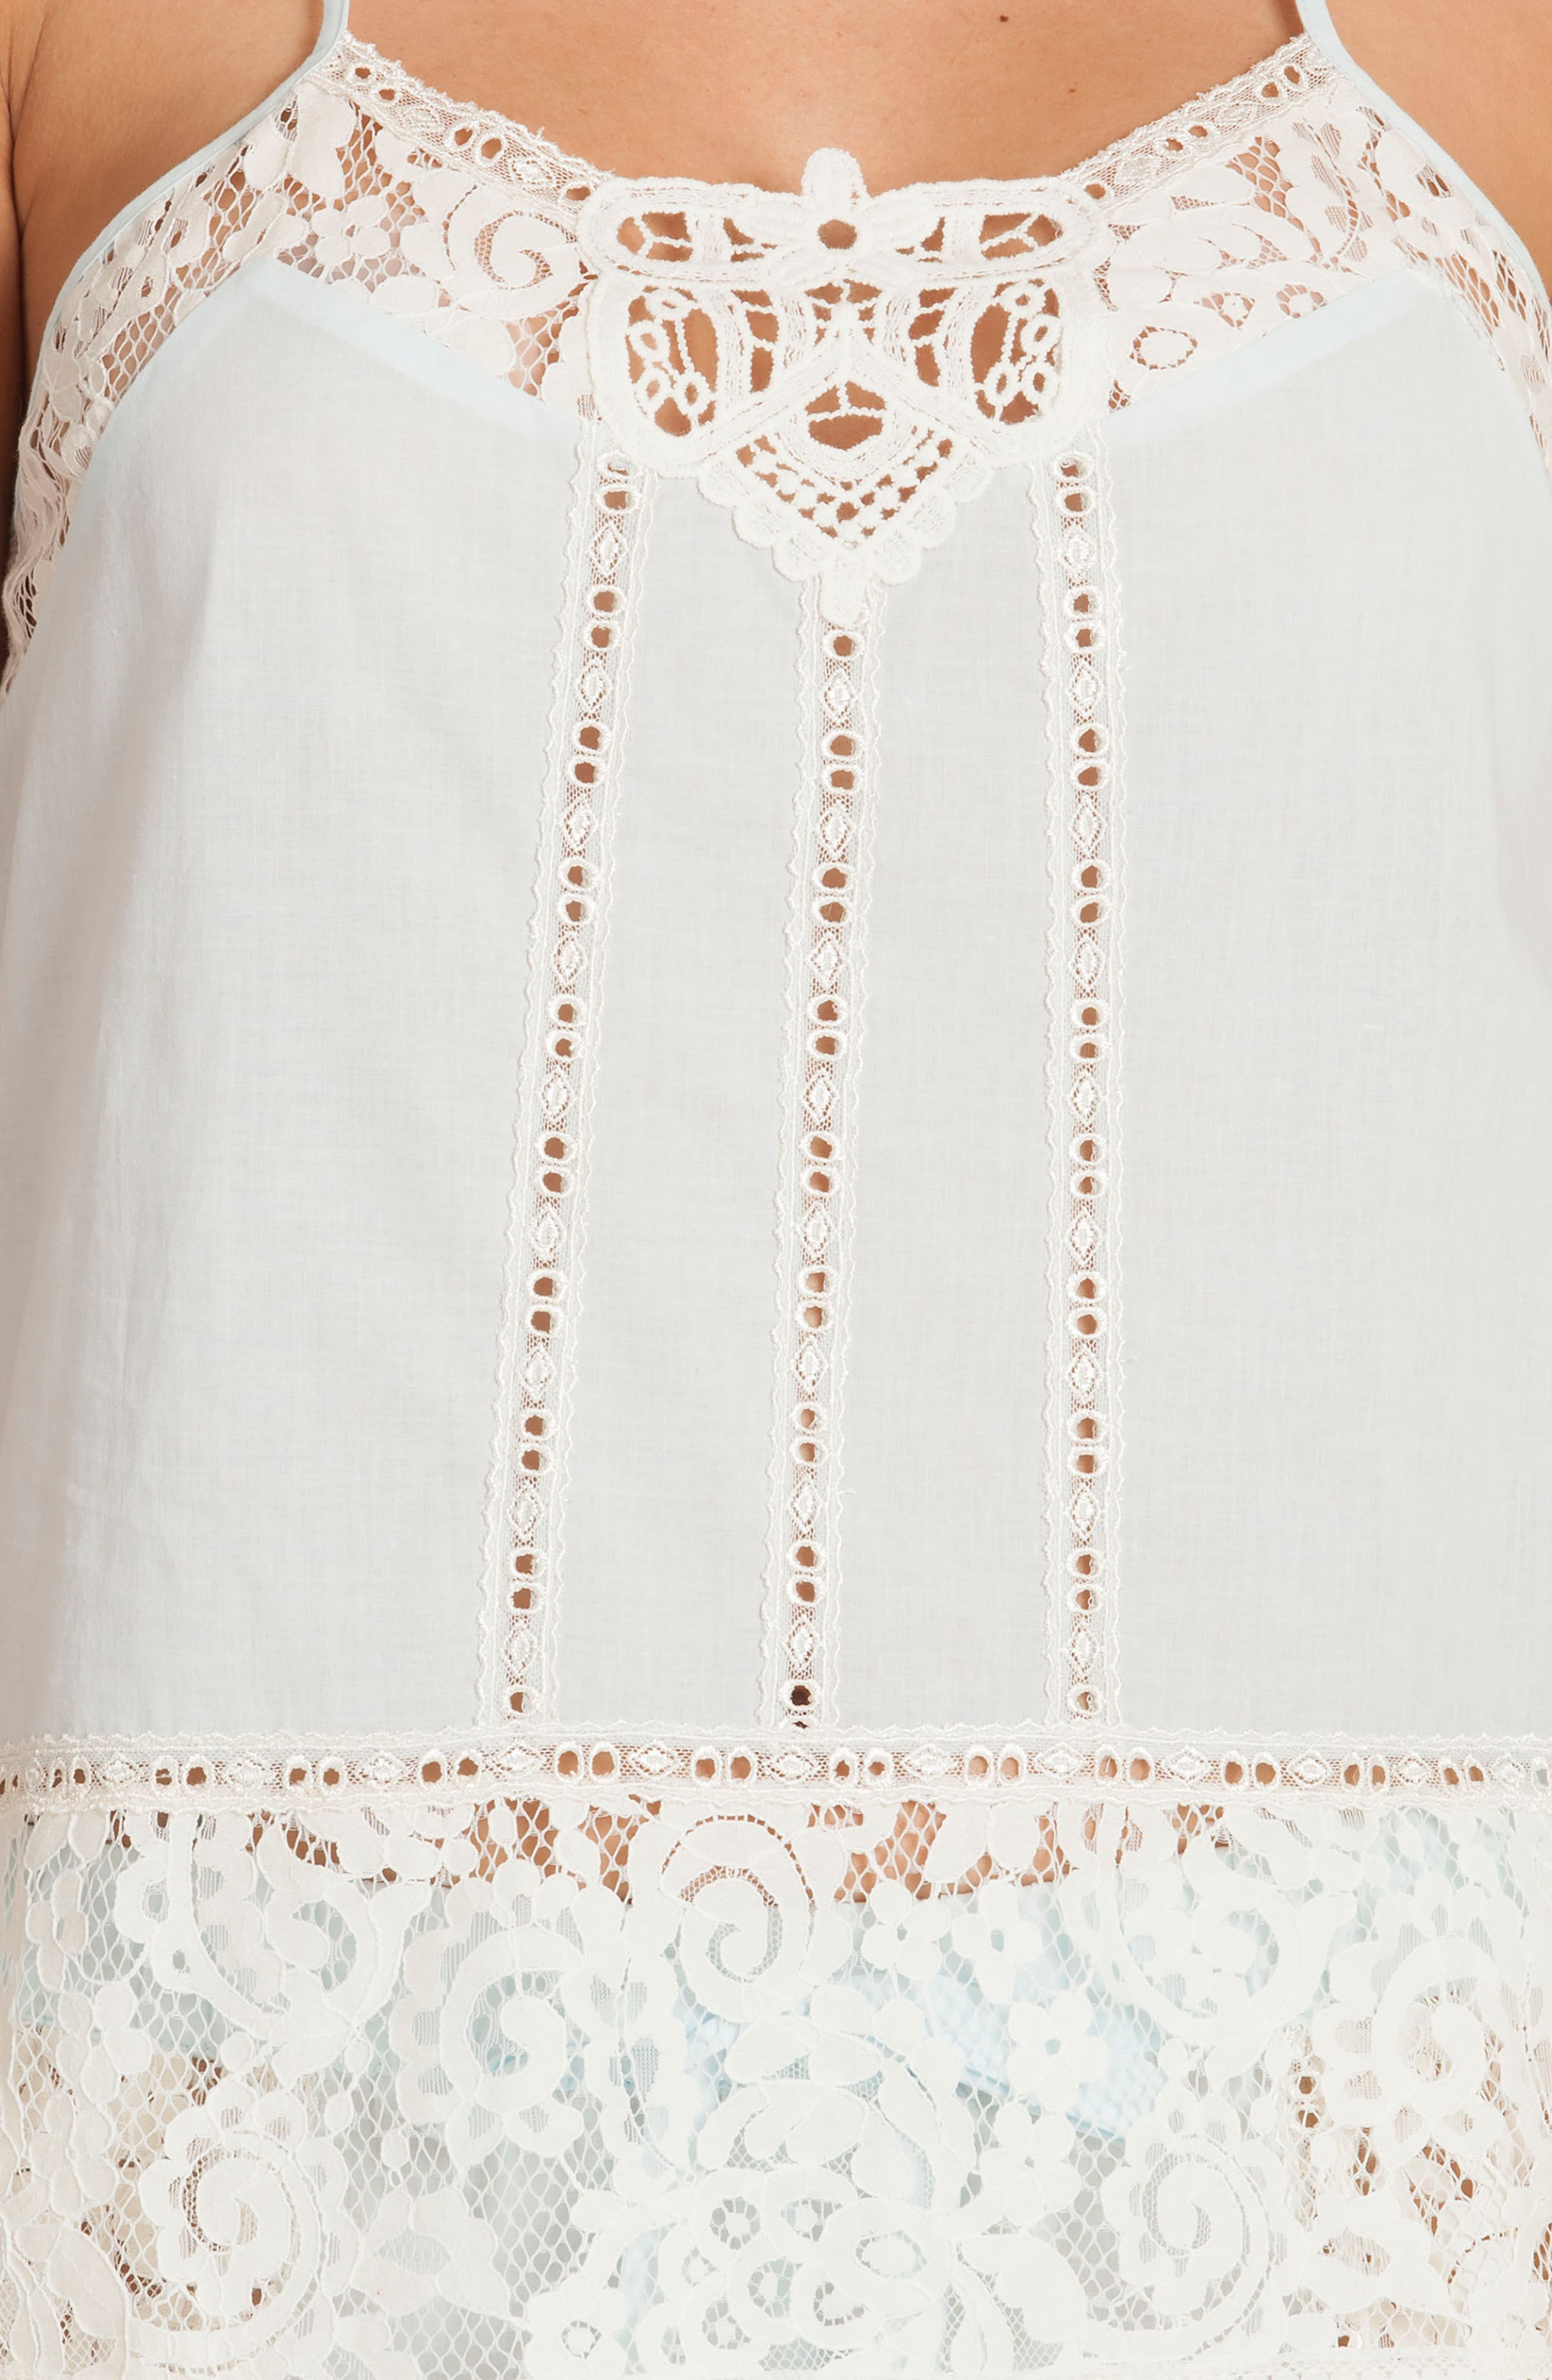 Eyelet Cotton Short Pajamas,                             Alternate thumbnail 5, color,                             Skyfall/ Beige